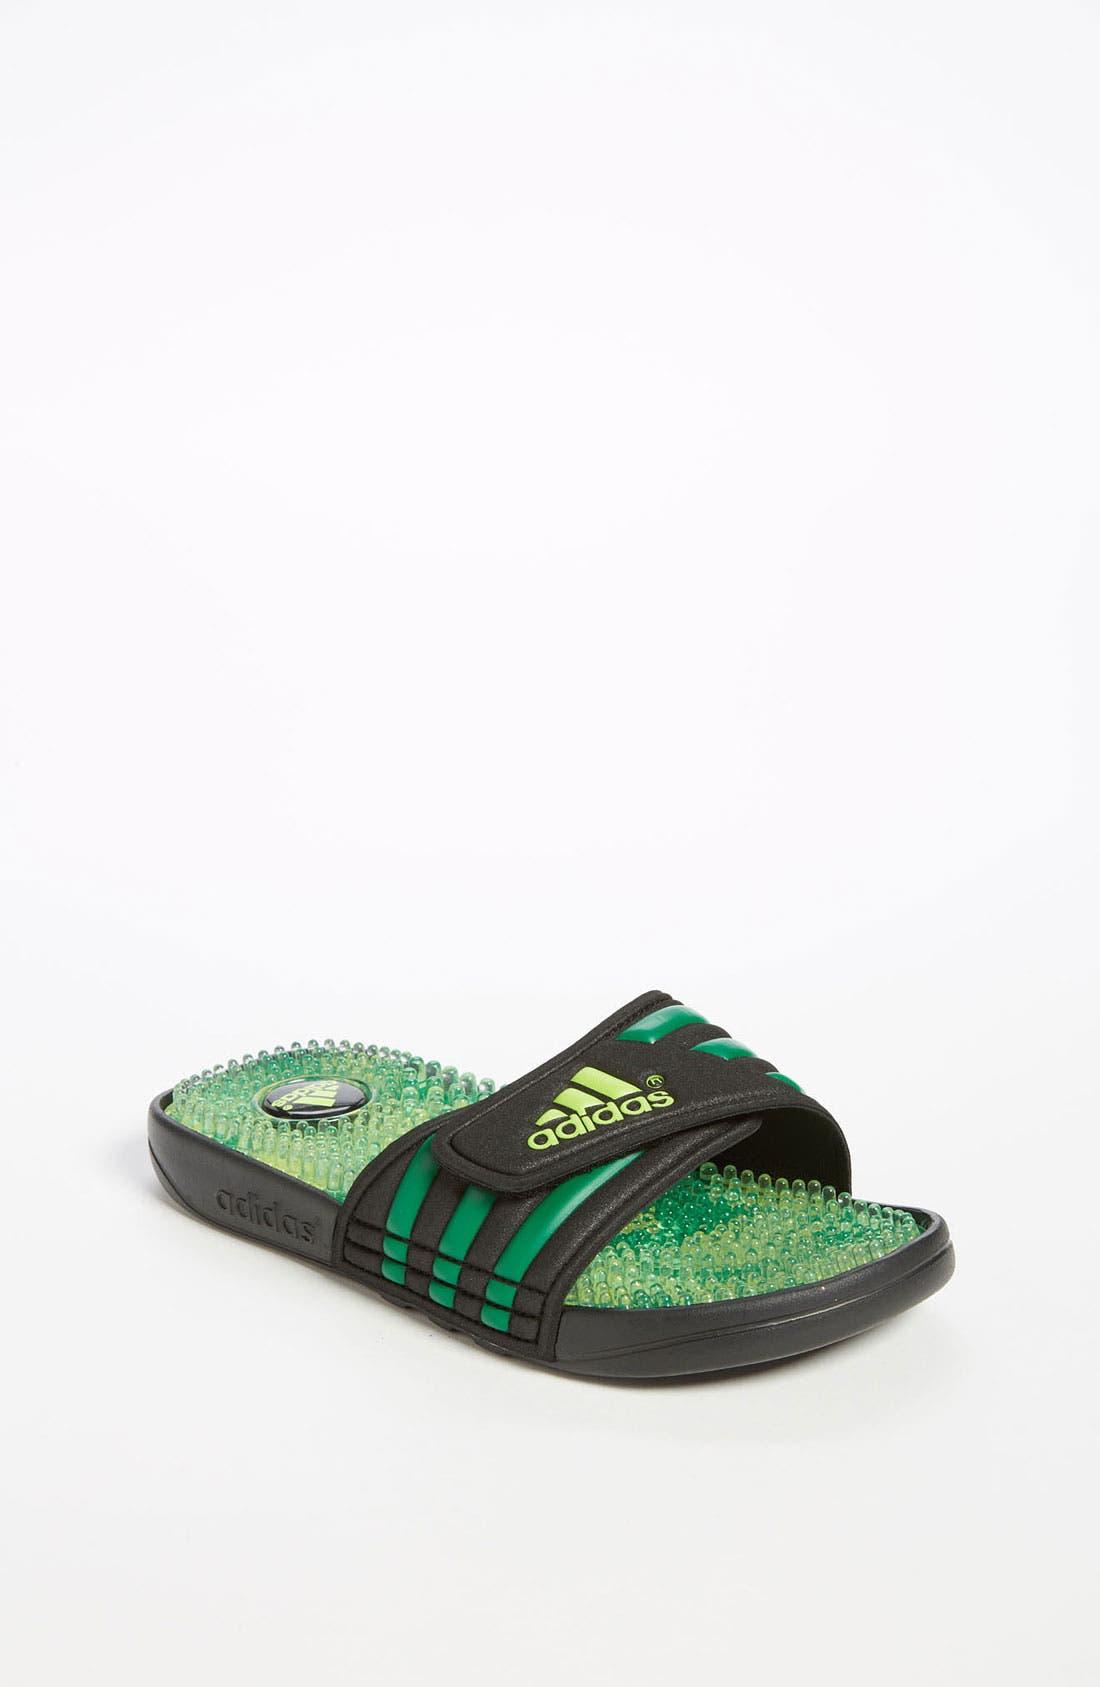 Main Image - adidas 'Adissage - Camo' Sandal (Toddler, Little Kid & Big Kid)